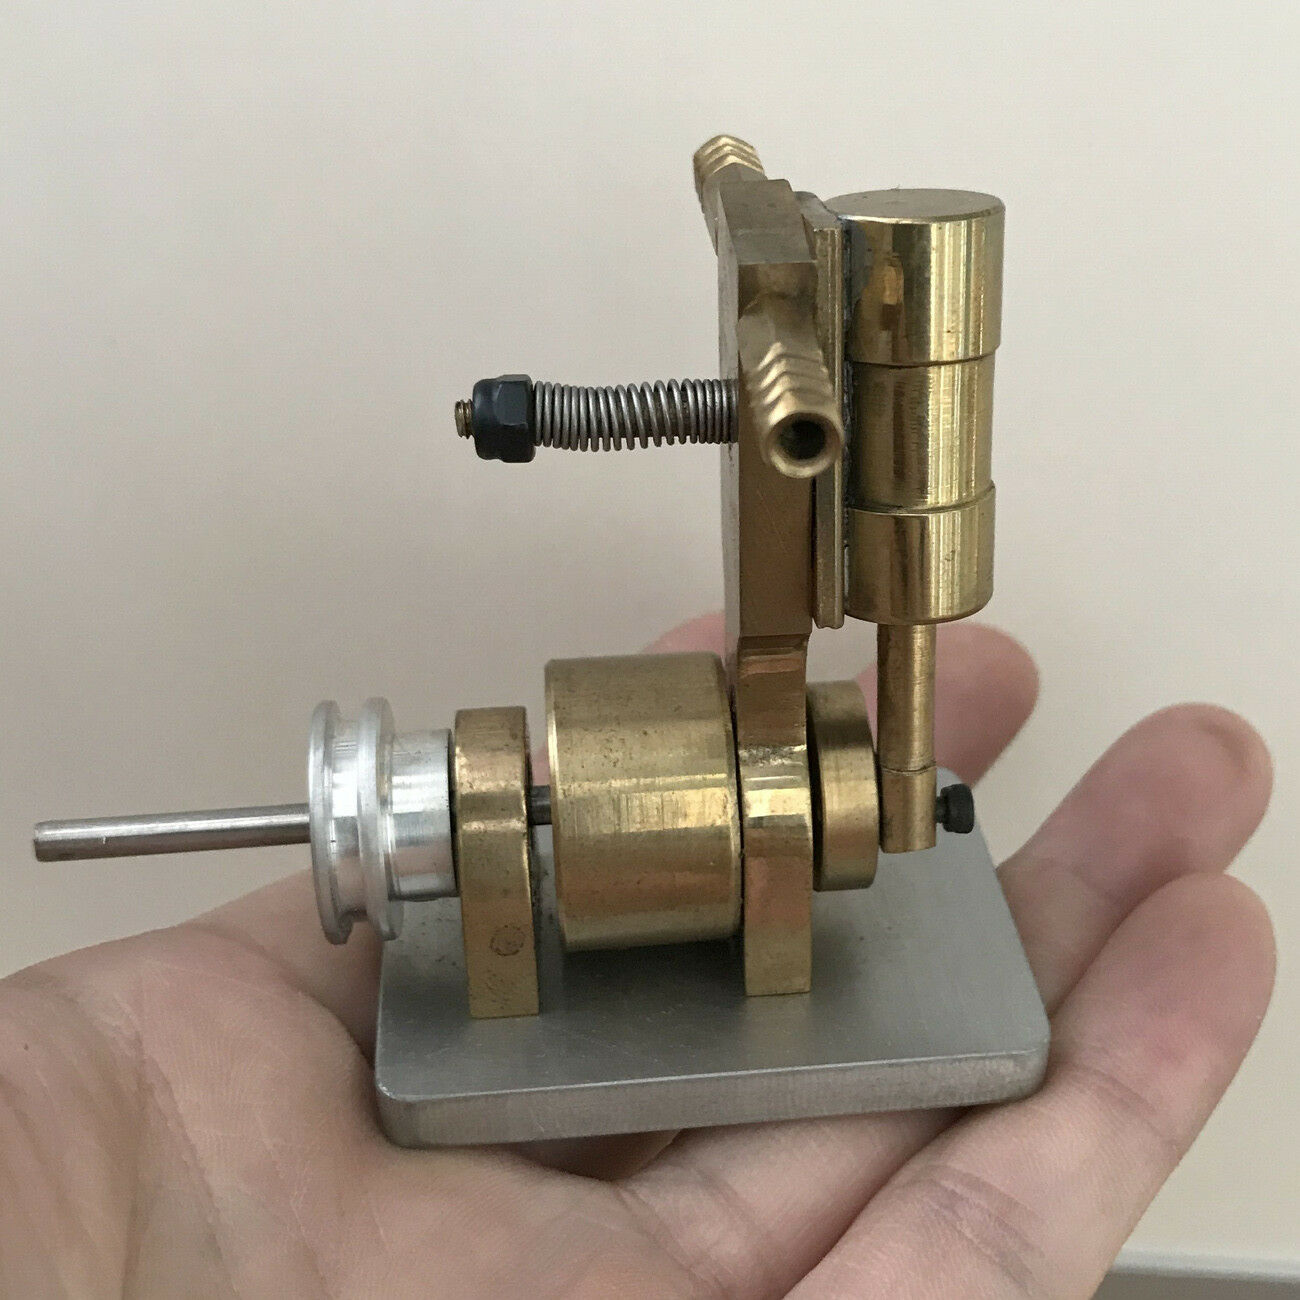 New greenical Cylinder Steam Engine Model Toy DIY Marine Model Motor Power Kit